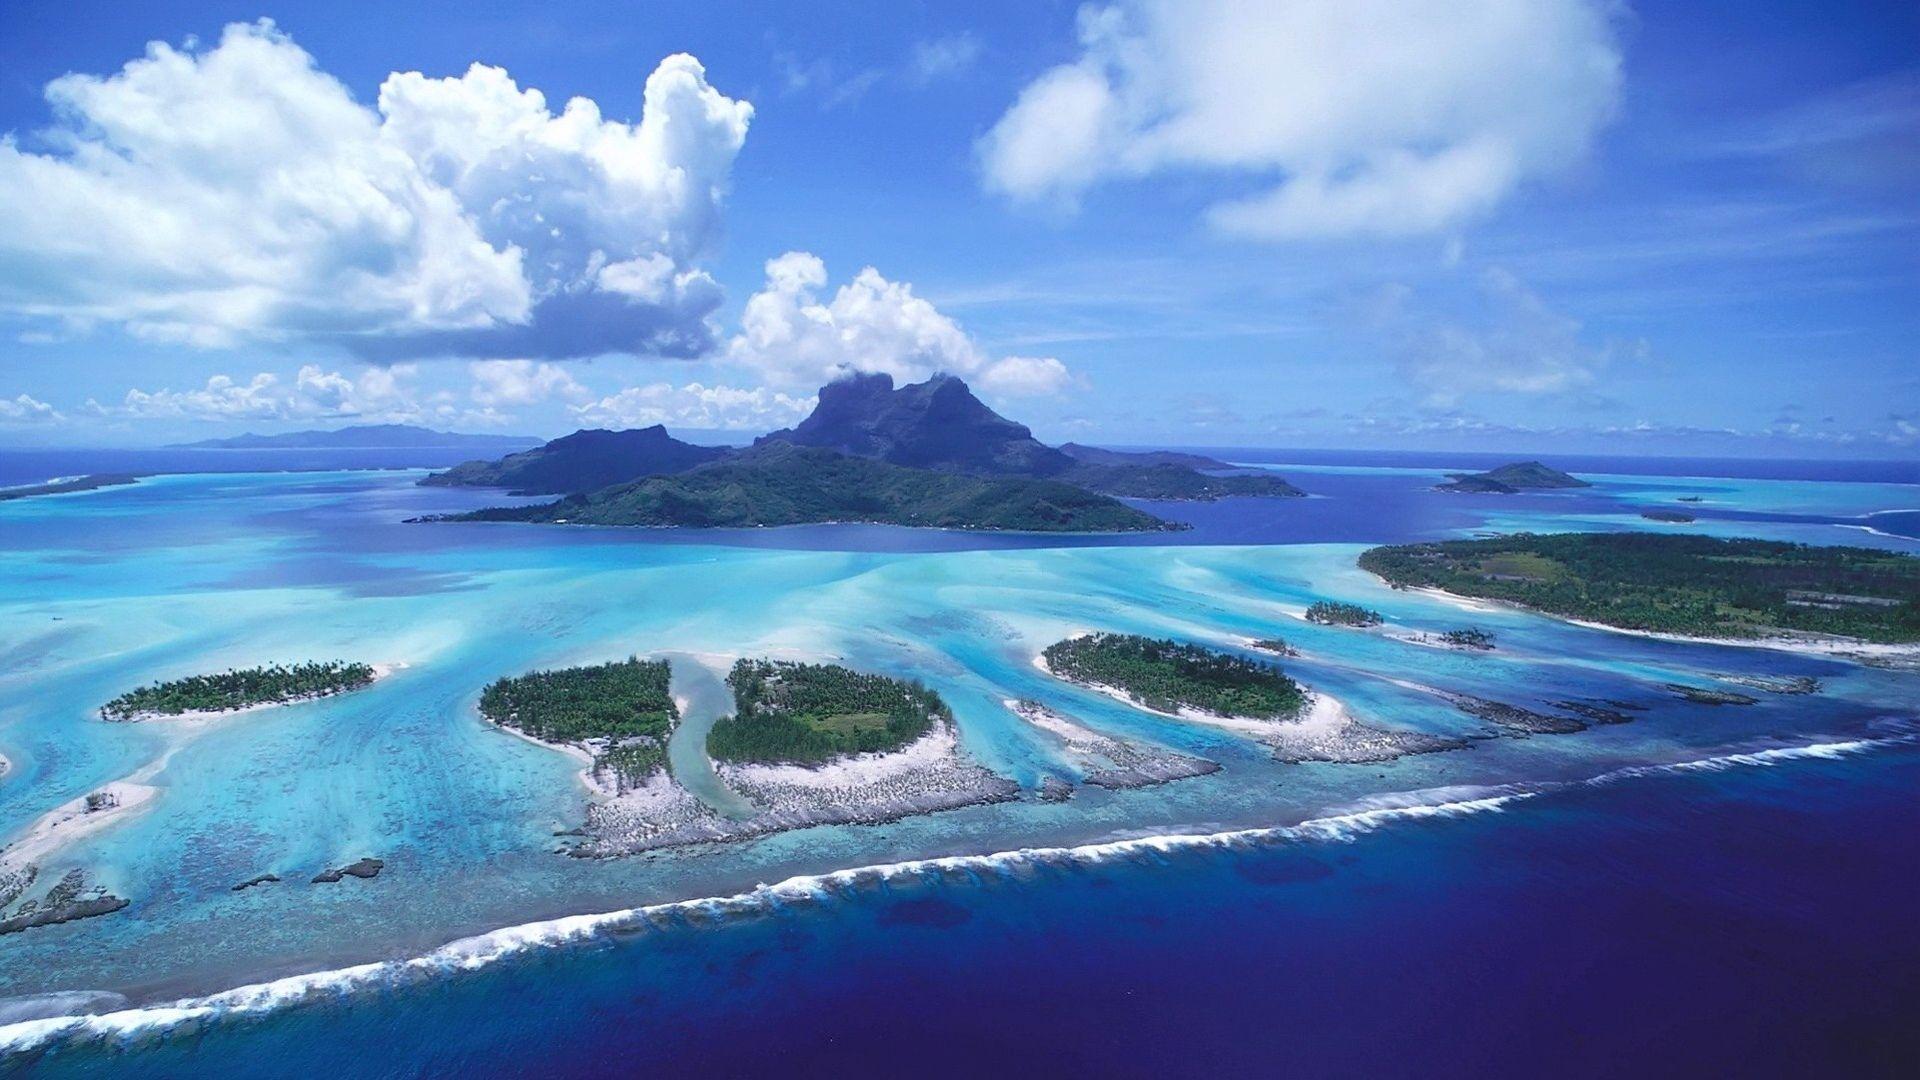 Bora Bora computer background